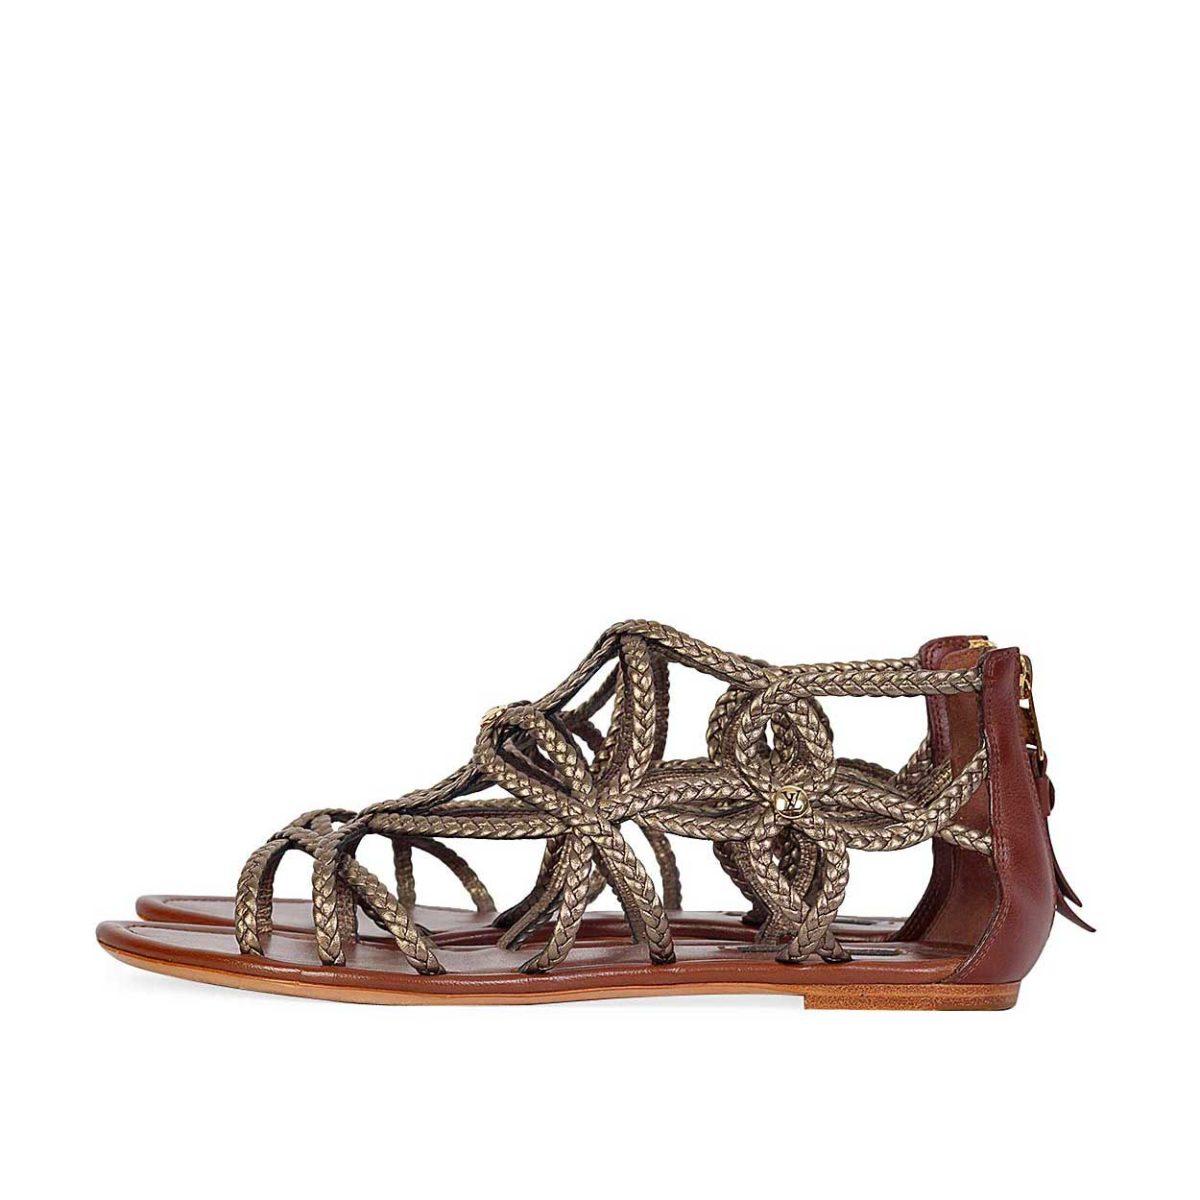 LOUIS VUITTON Bronze Gladiator Flat Sandals – S  38 (5)